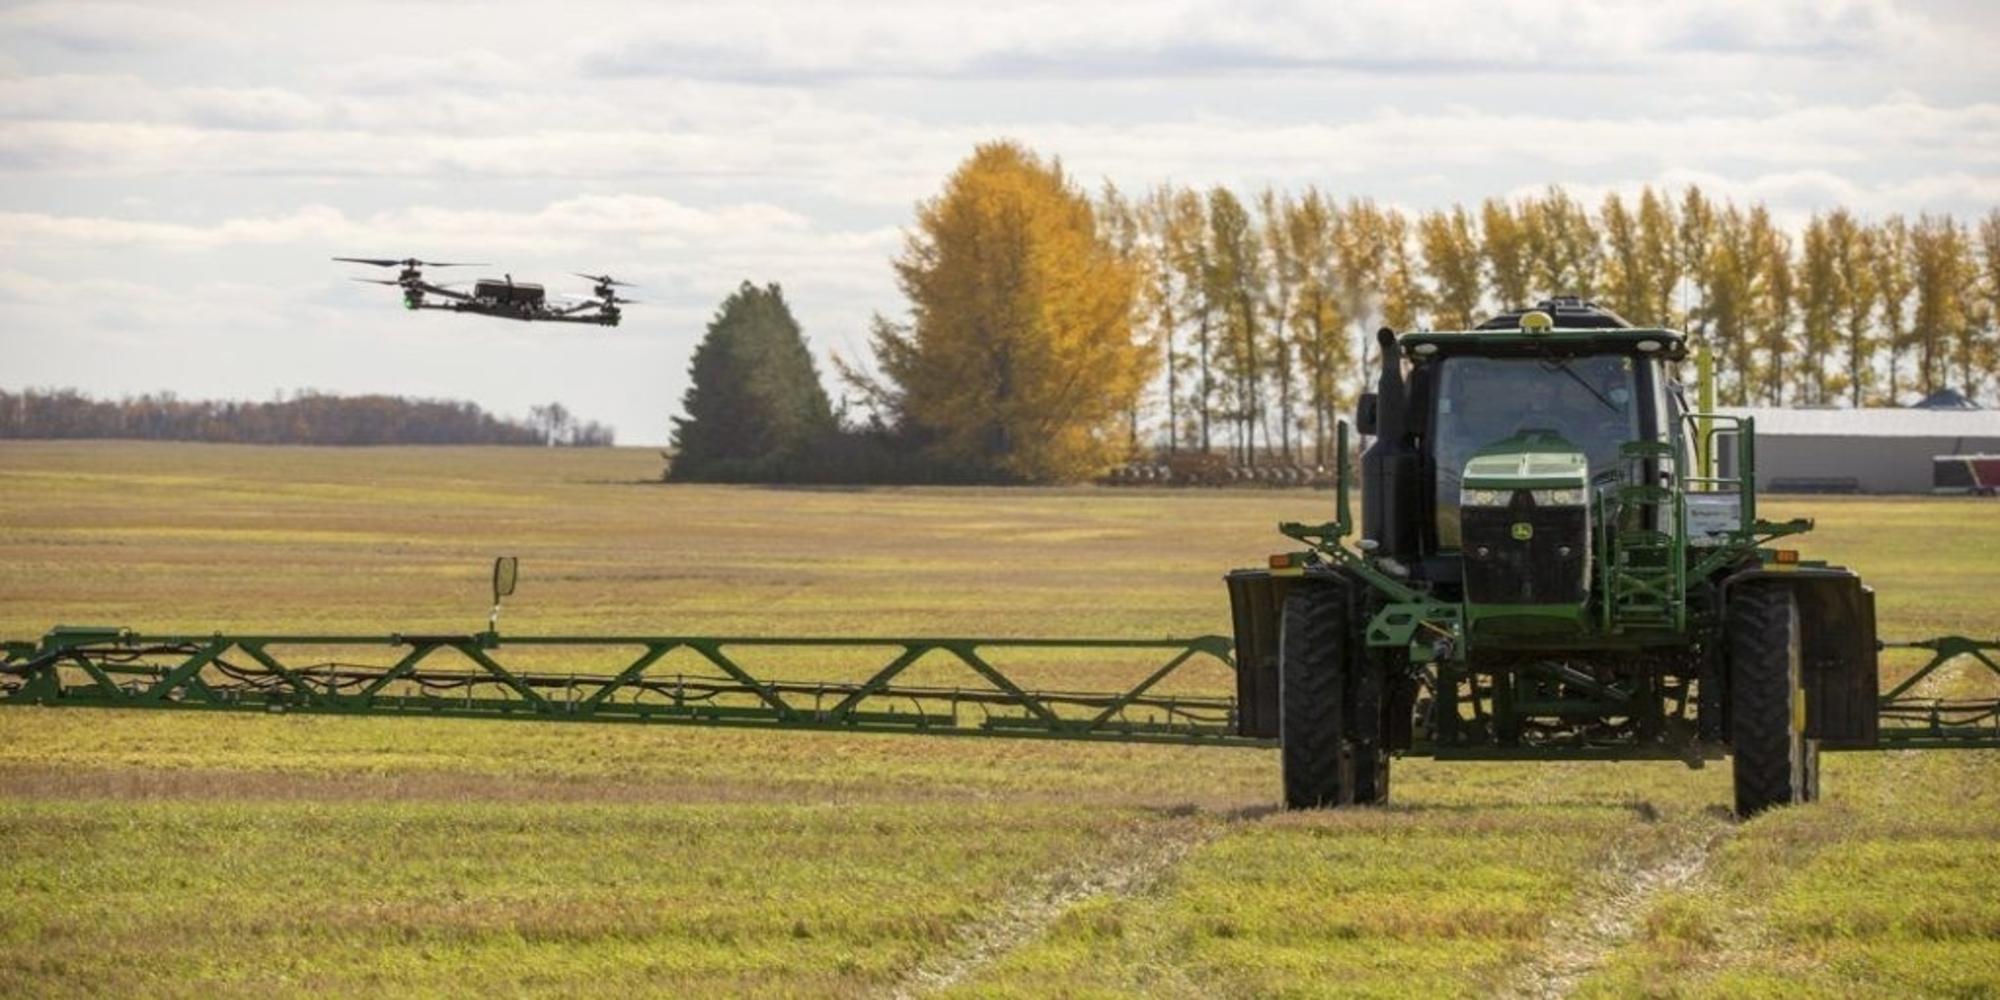 Precision farming company raises $20M to deploy AI drone swarms